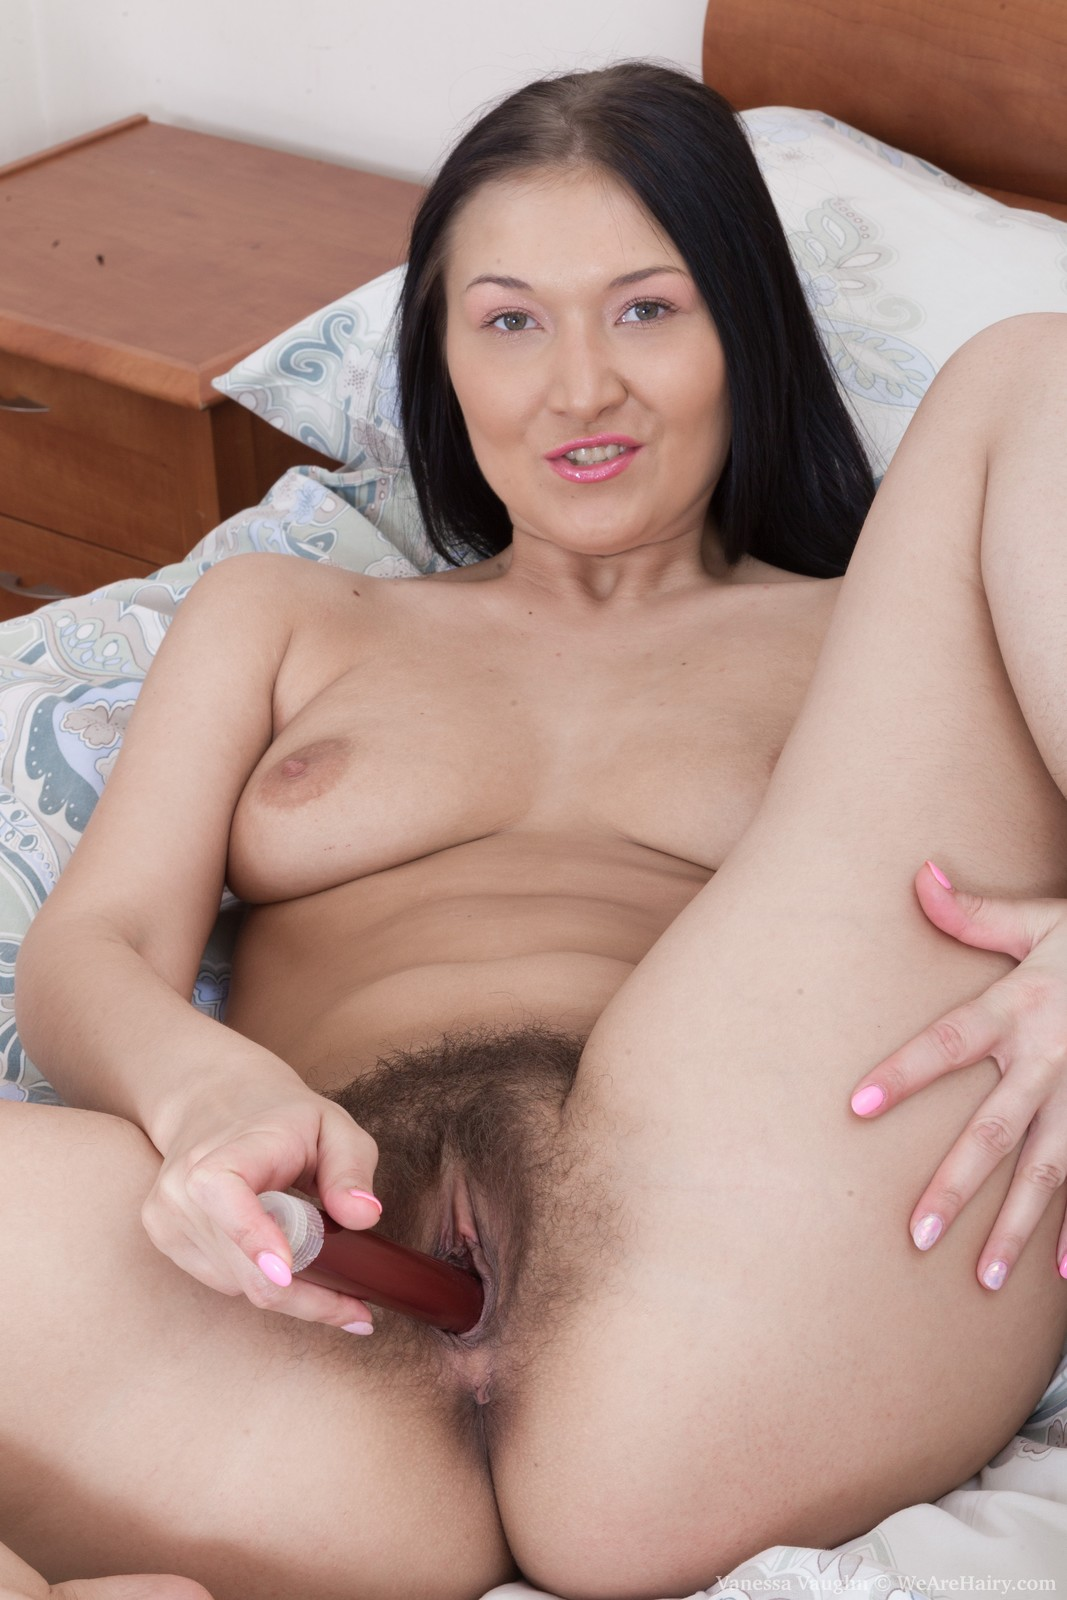 vanessa-vaughn-masturbates-in-bed-with-a-red-toy11.jpg